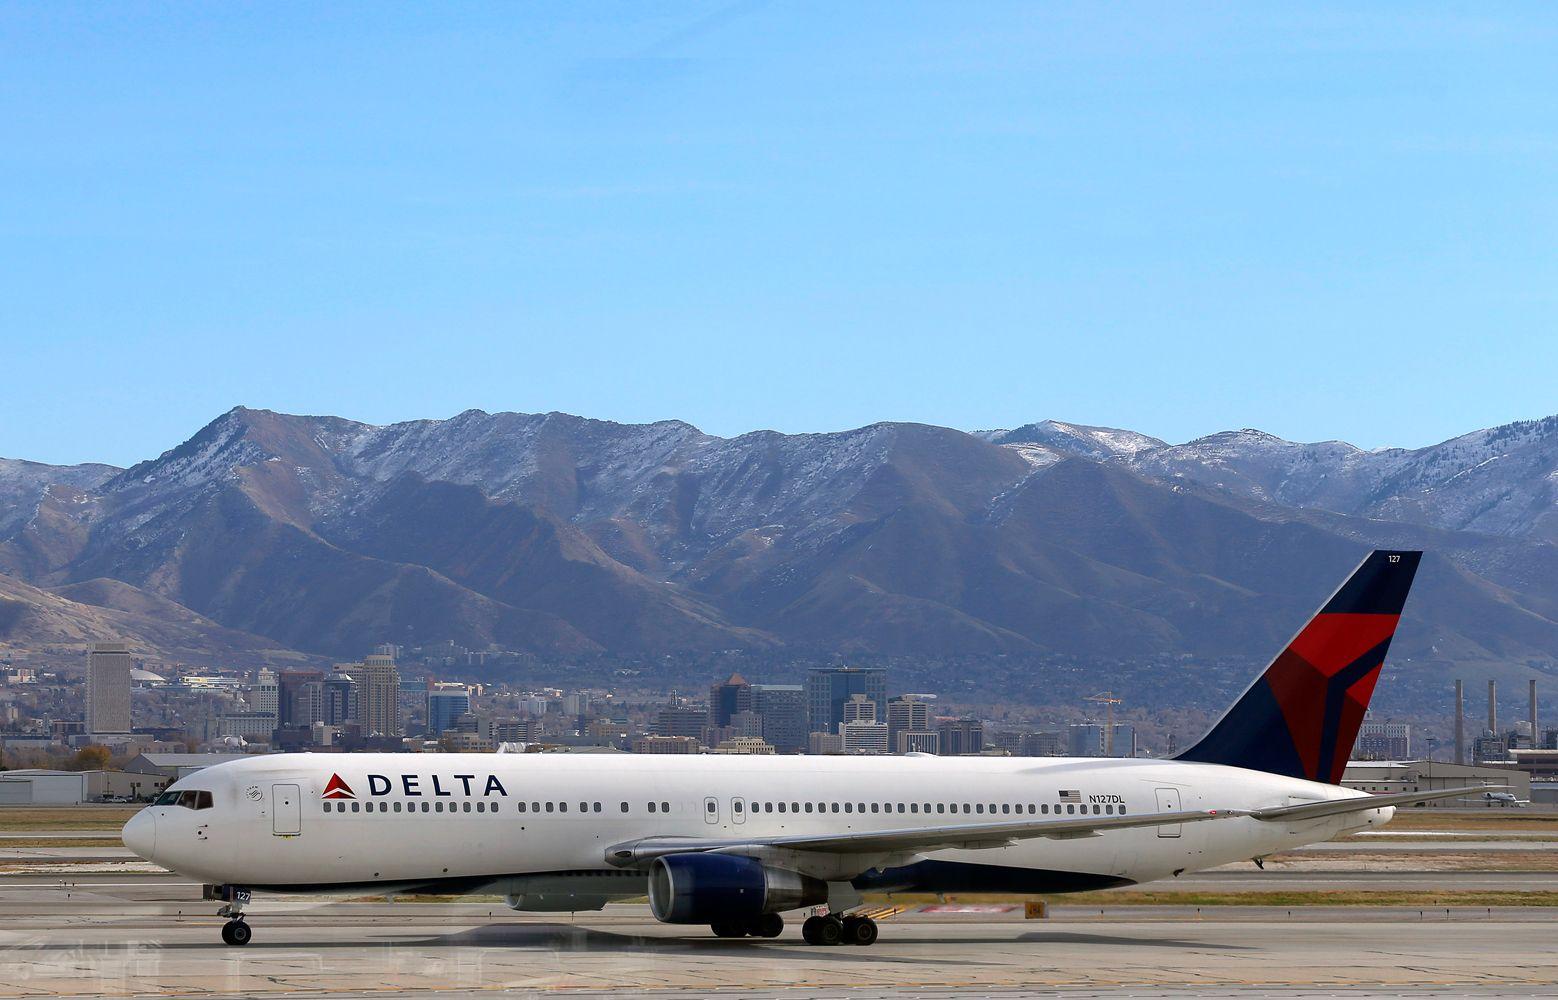 Boing 767 Delta